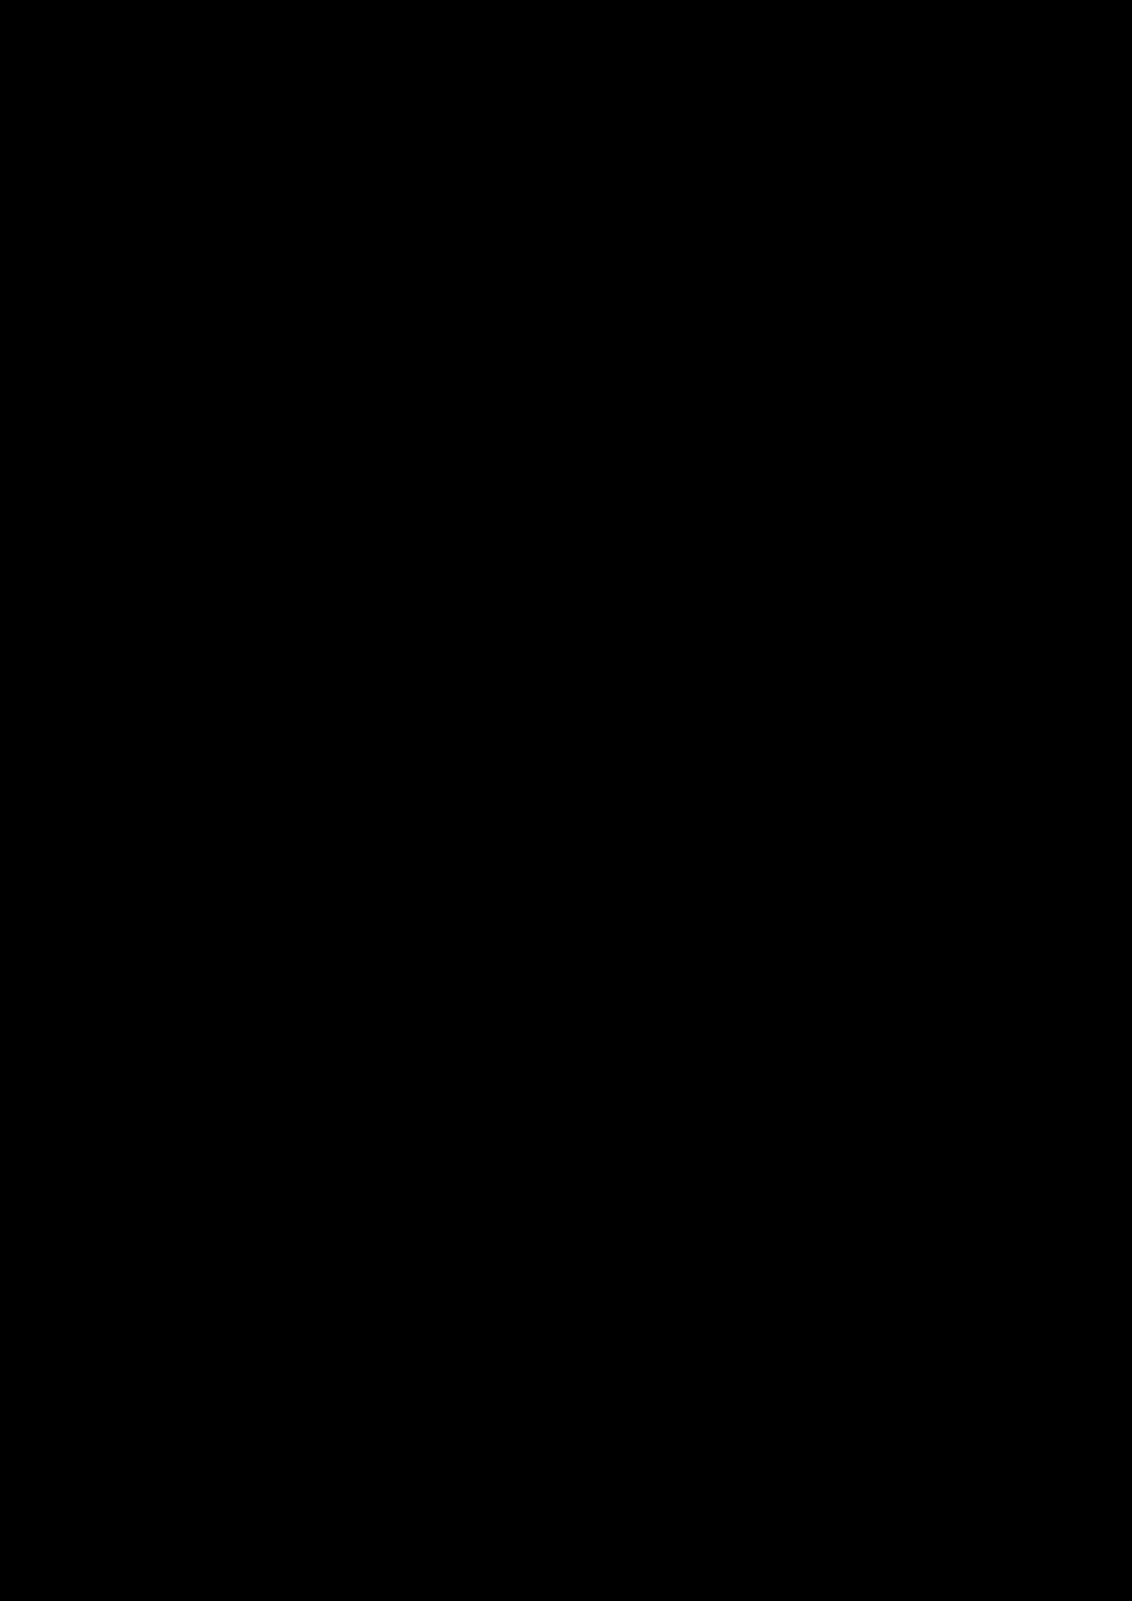 Romans o sleze slide, Image 19